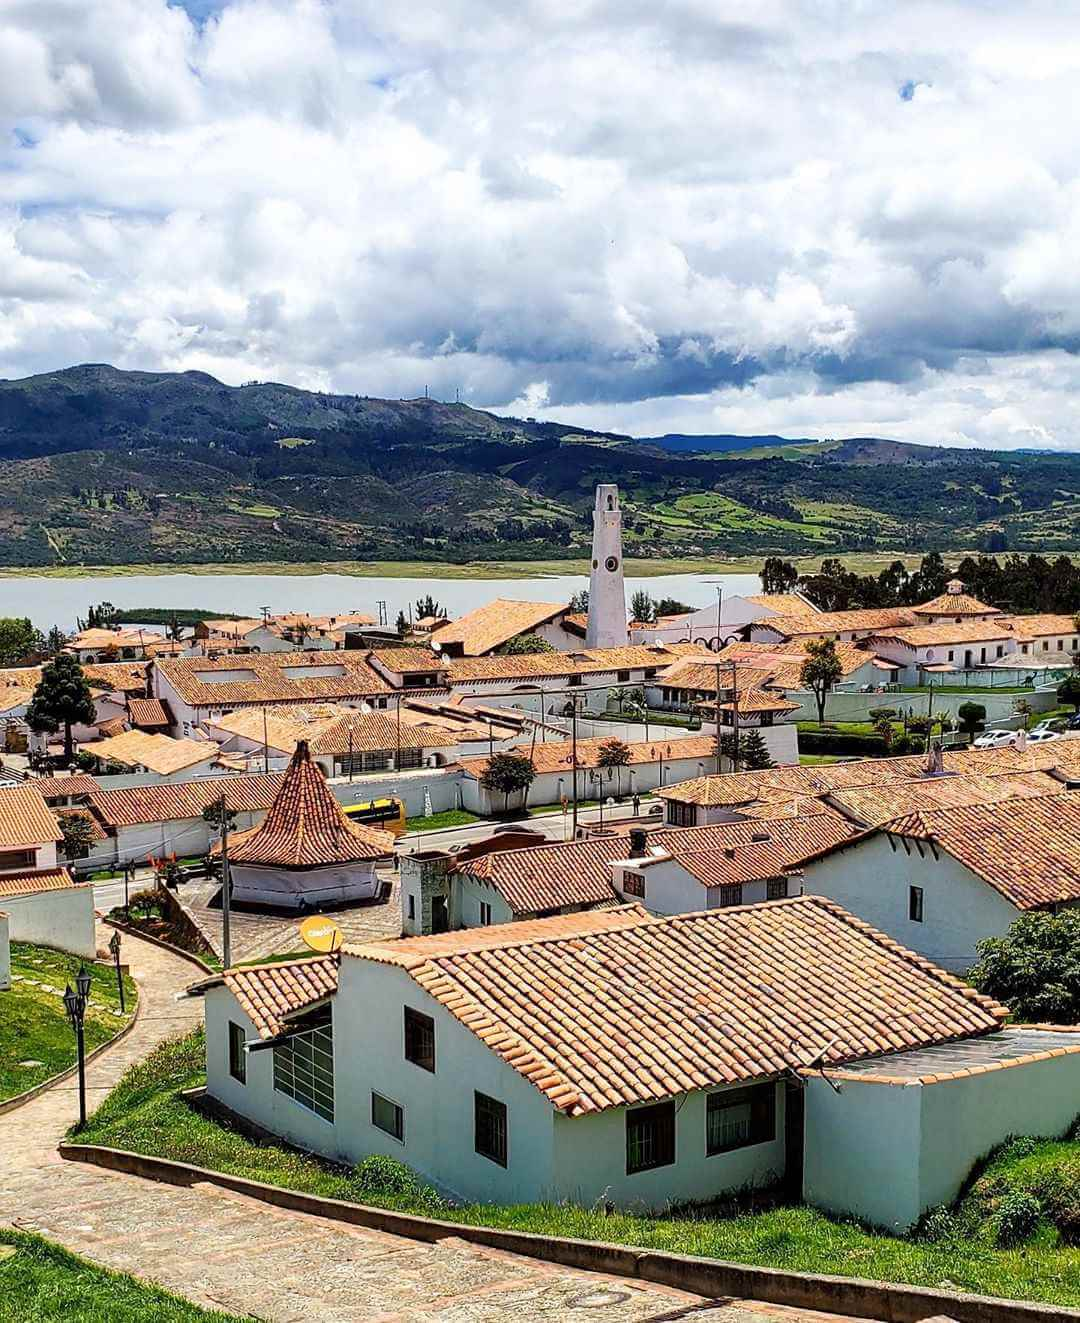 Destinos semana de receso cerca a Bogotá